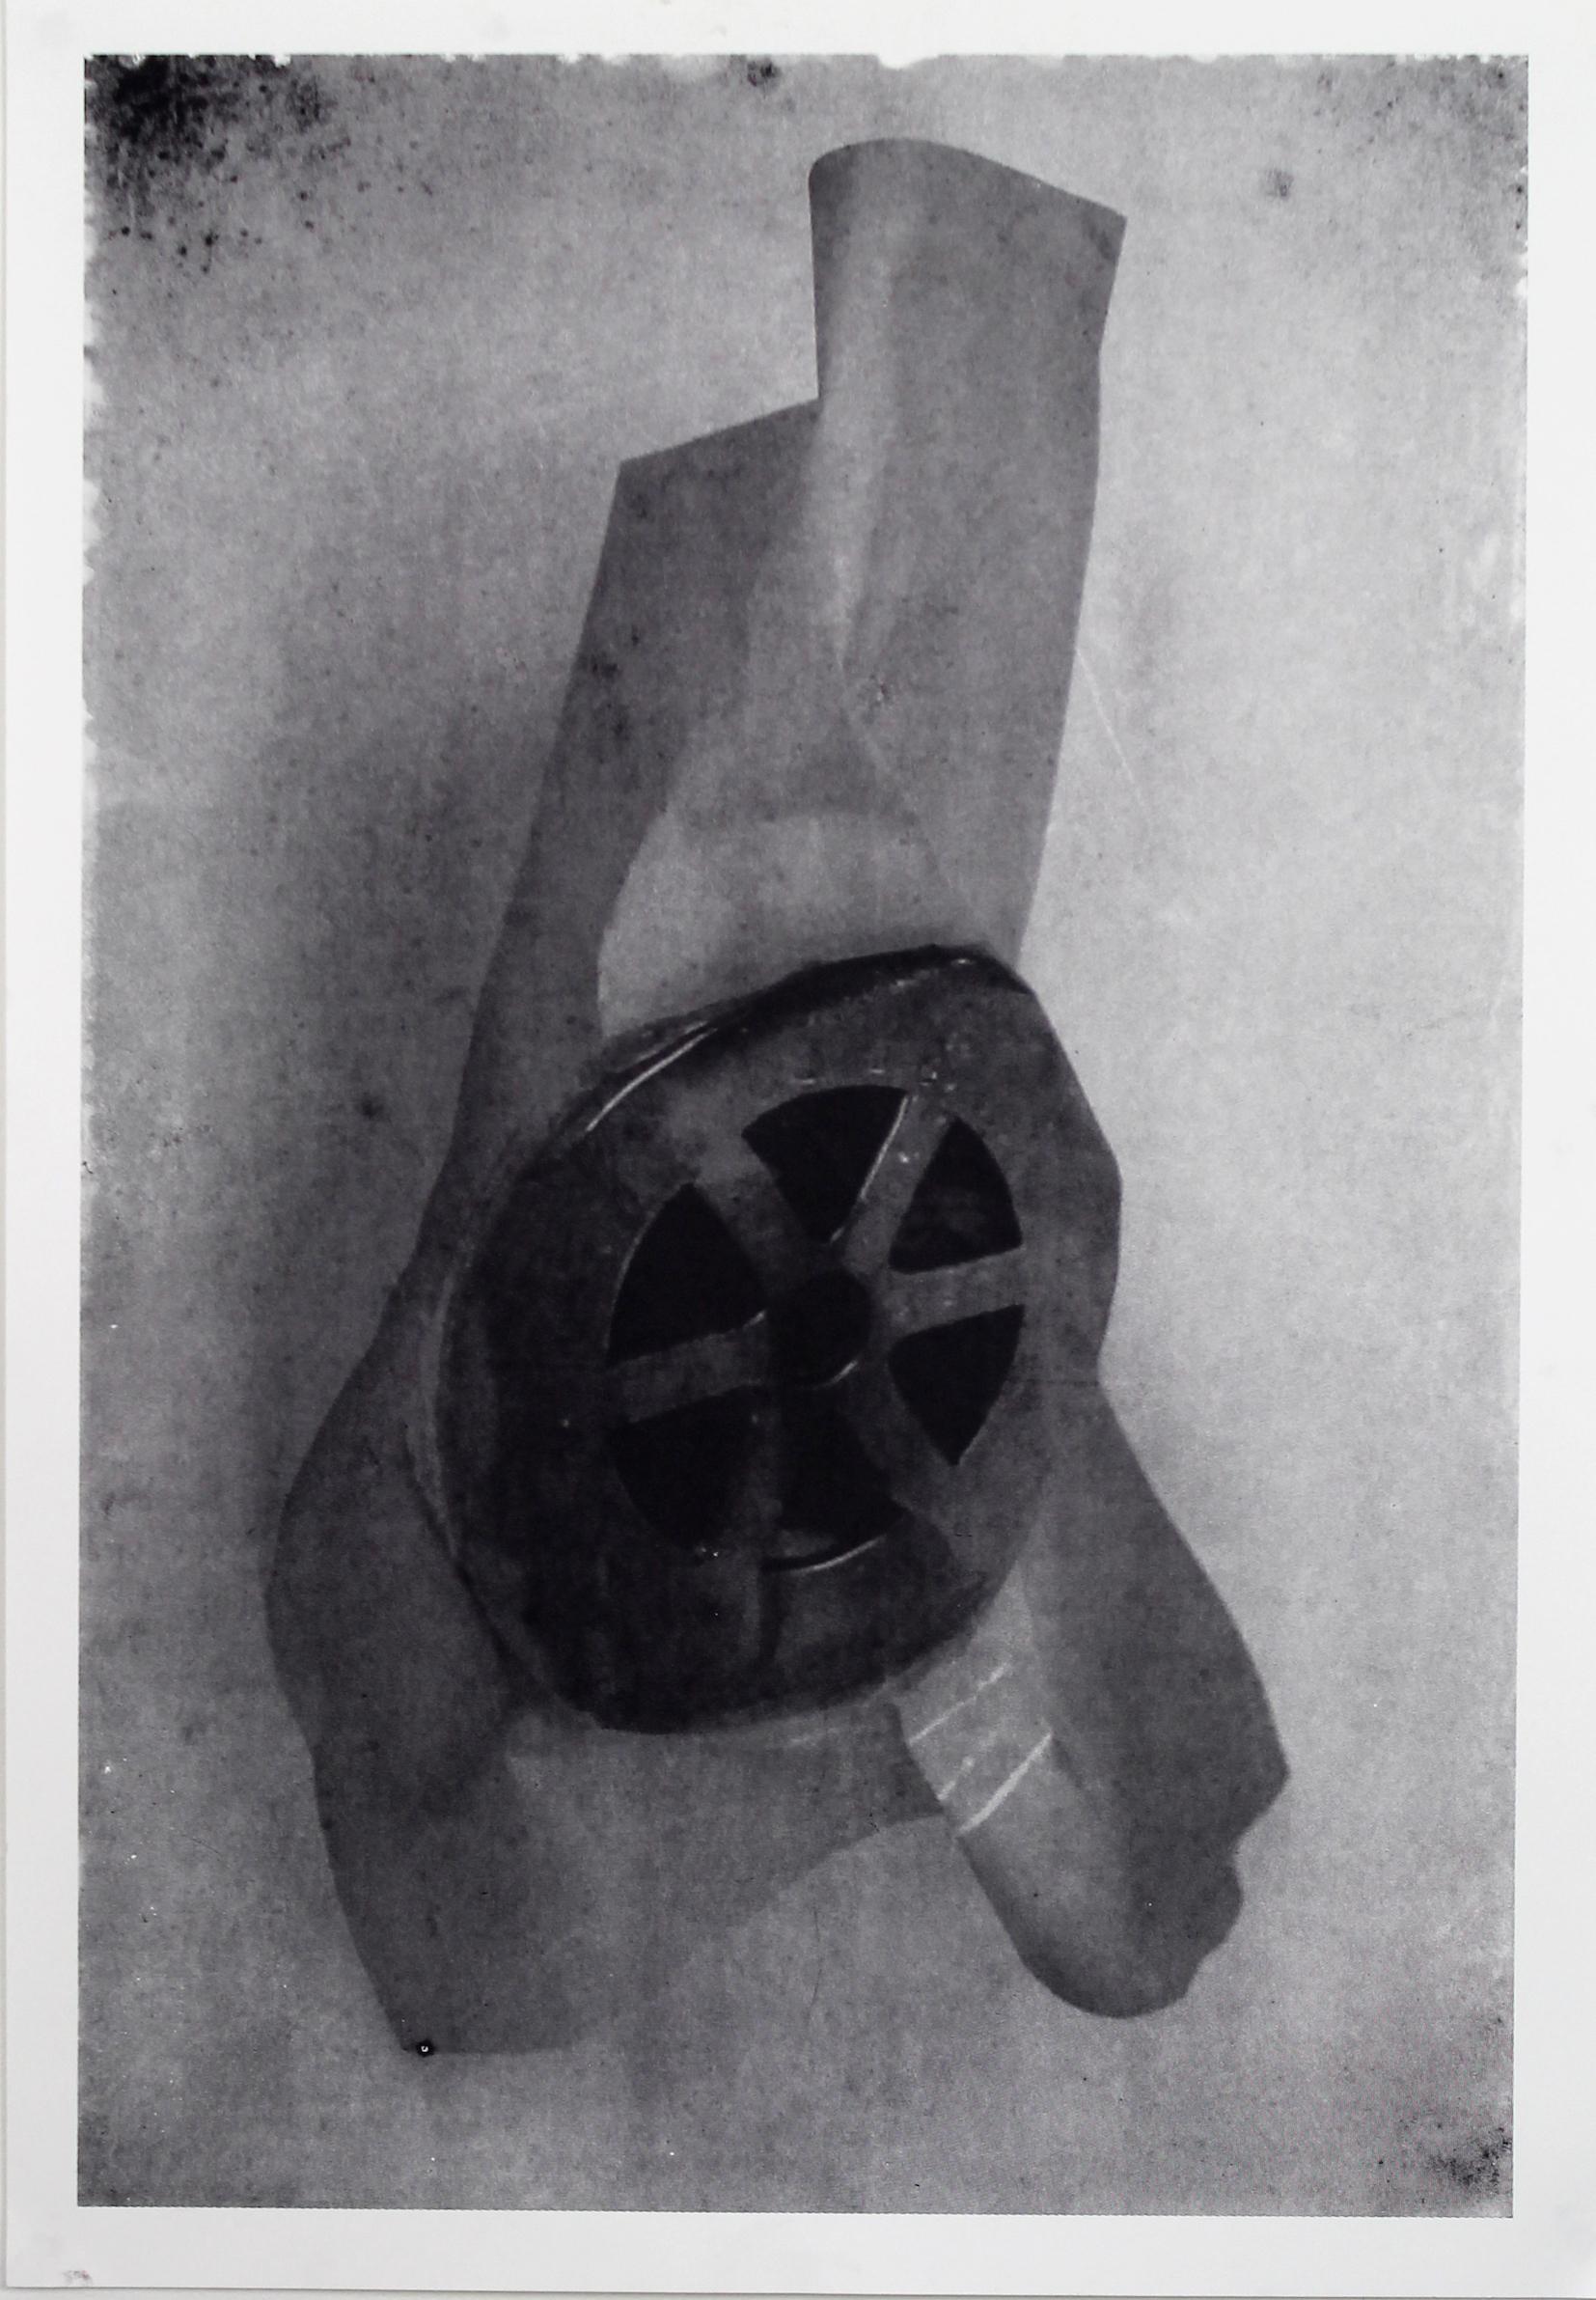 Louis jeck Prestidge, Paper plug, screenprint on paper, 84cmx59cm,  http://www.louisjeckprestidge.com